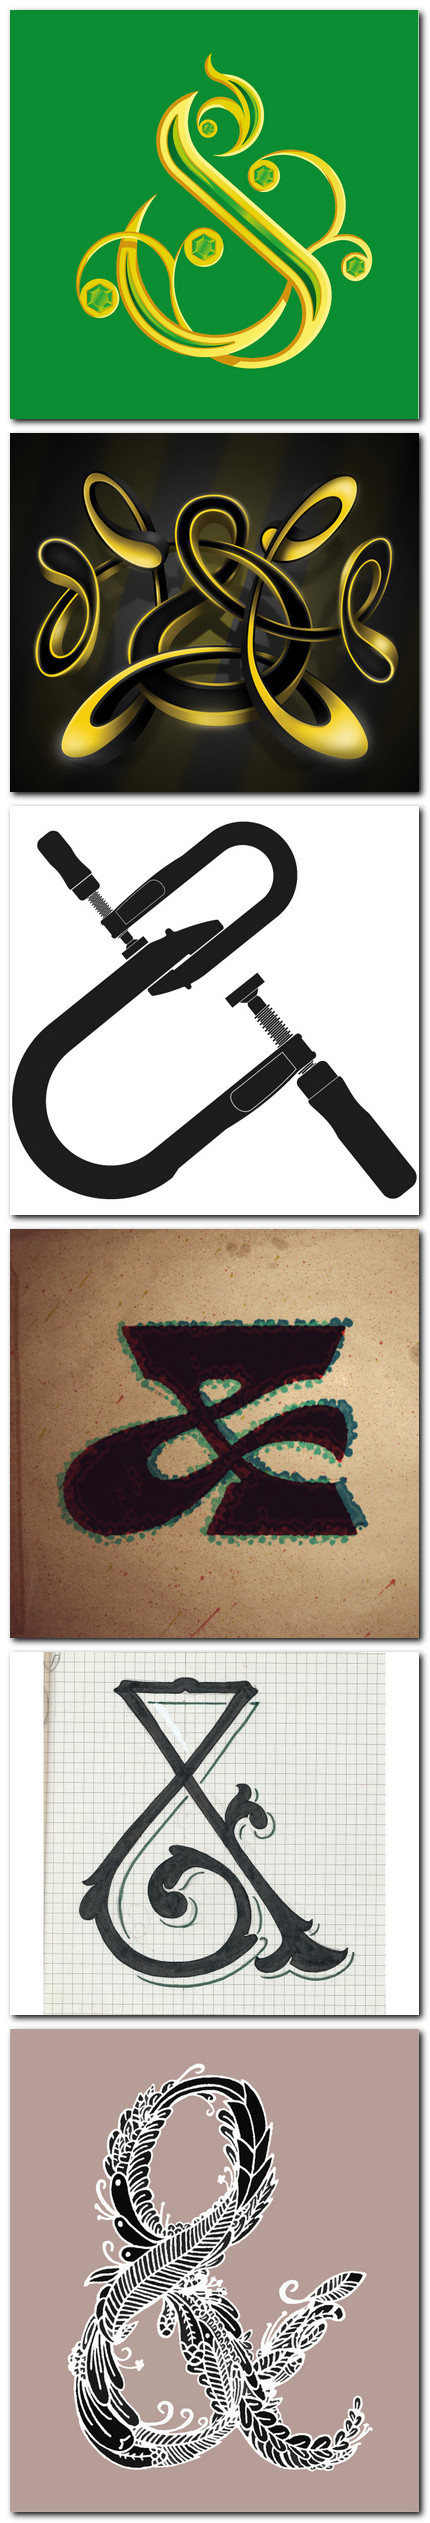 ampersand 1 pe lettercult